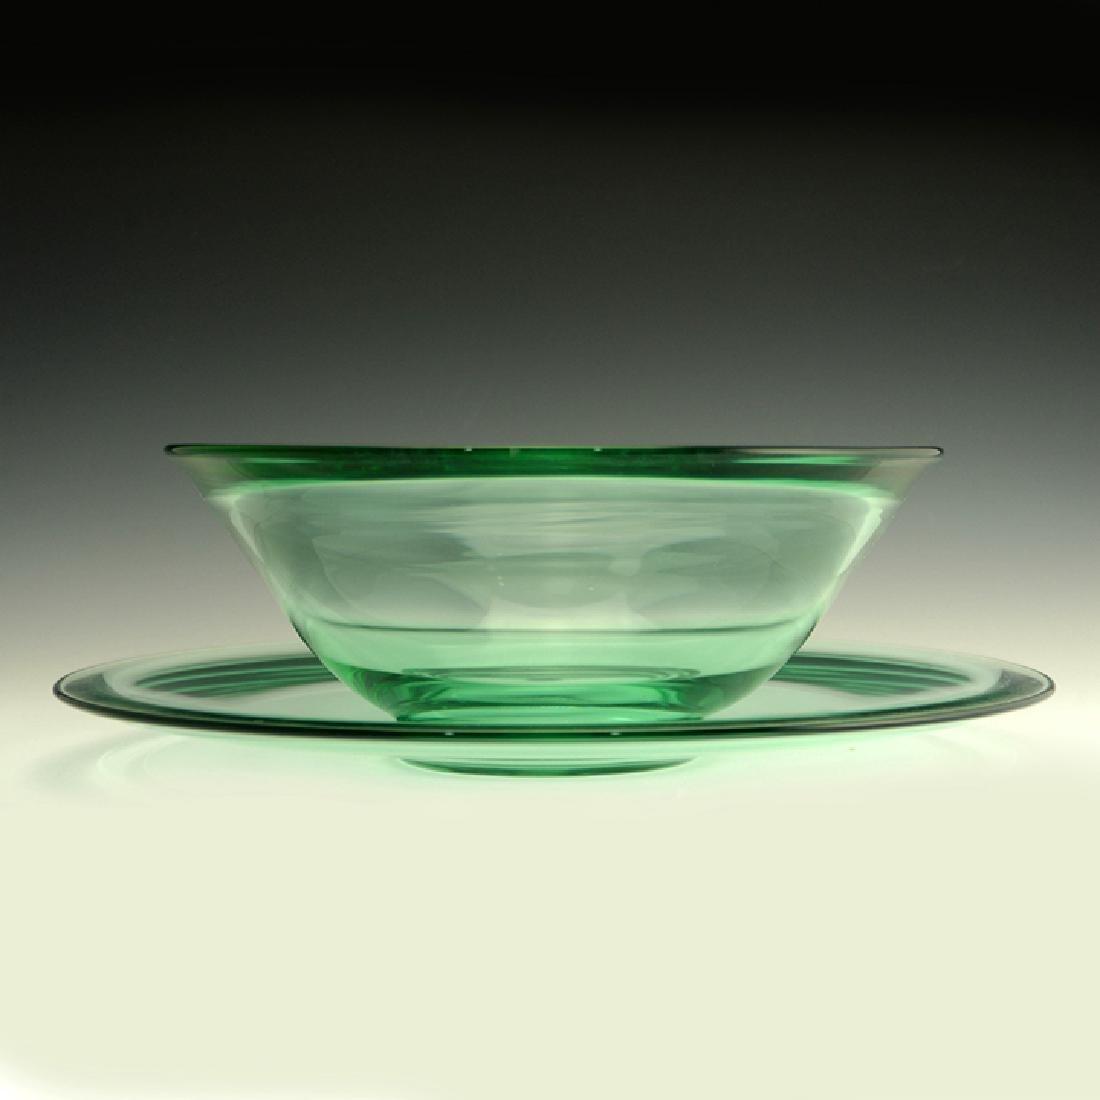 Very Rare Zeisel Heisey Glass Salad Set, original box - 2